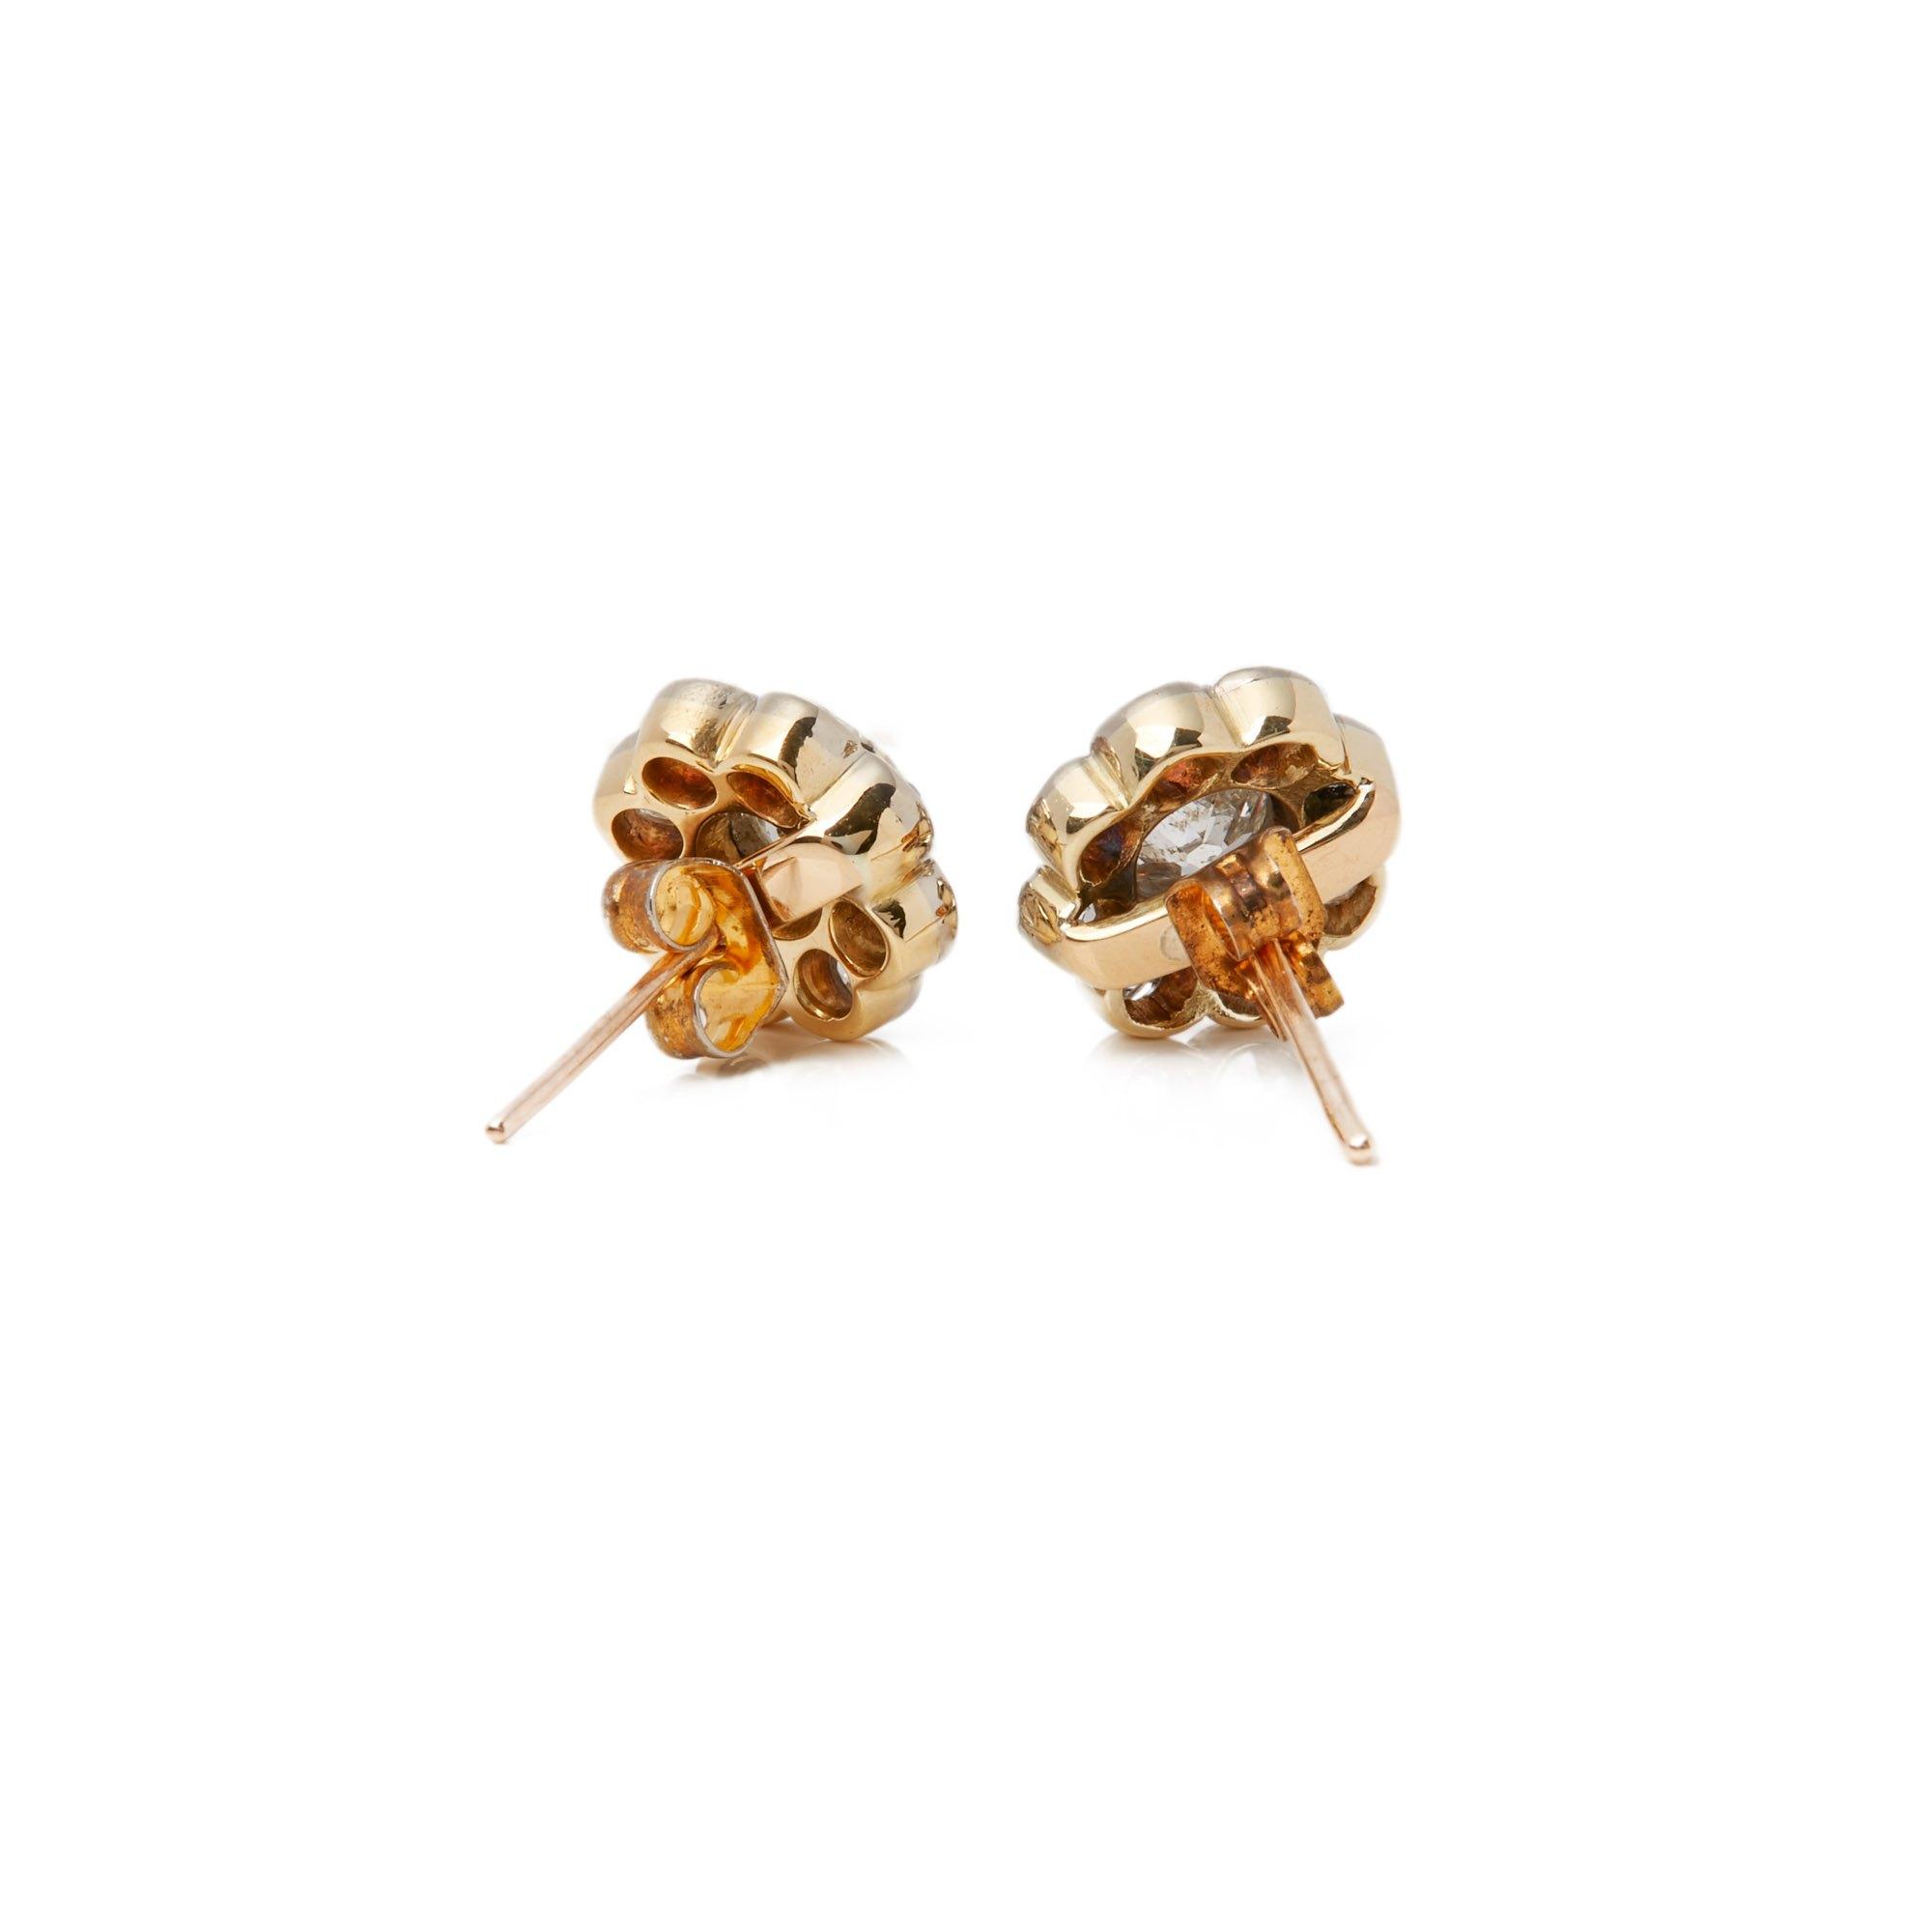 Diamond 18k Yellow Gold Old Cut Diamond Cluster Earrings